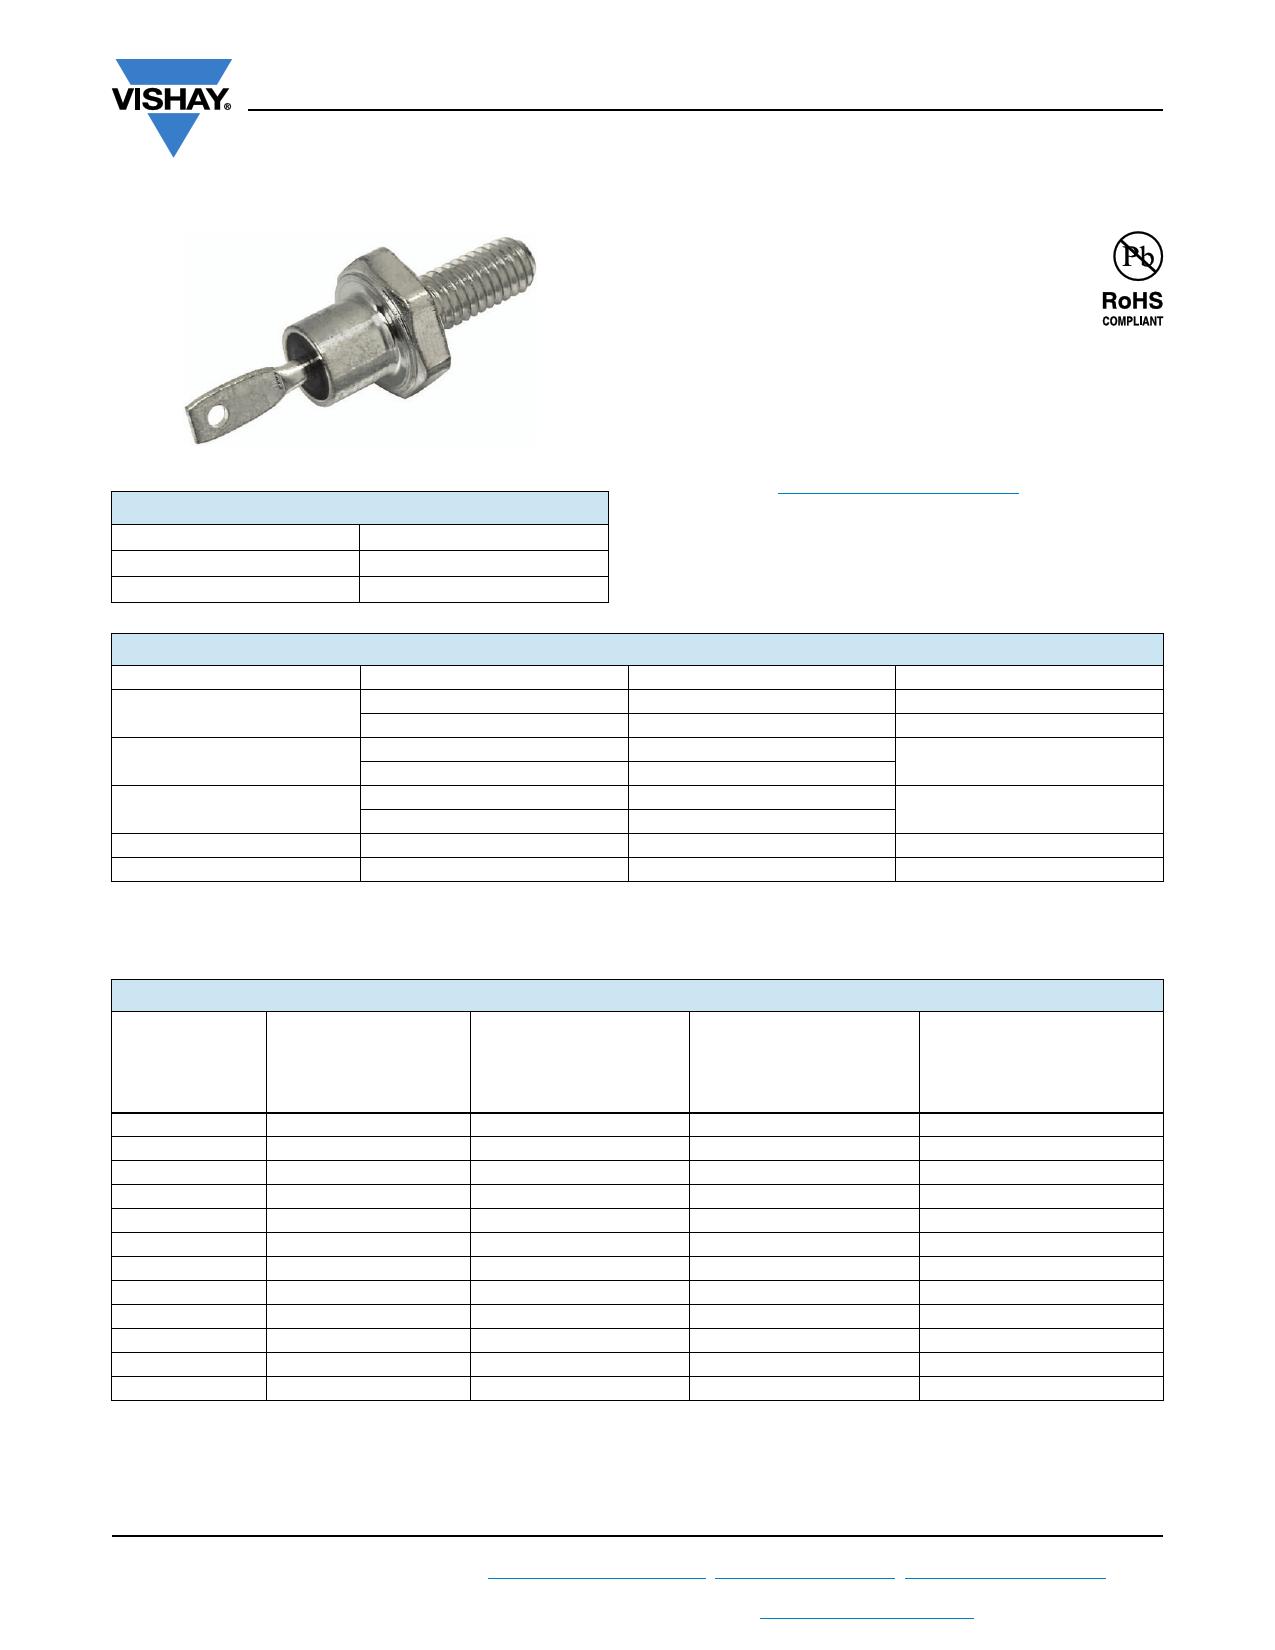 VS-1N1200A datasheet